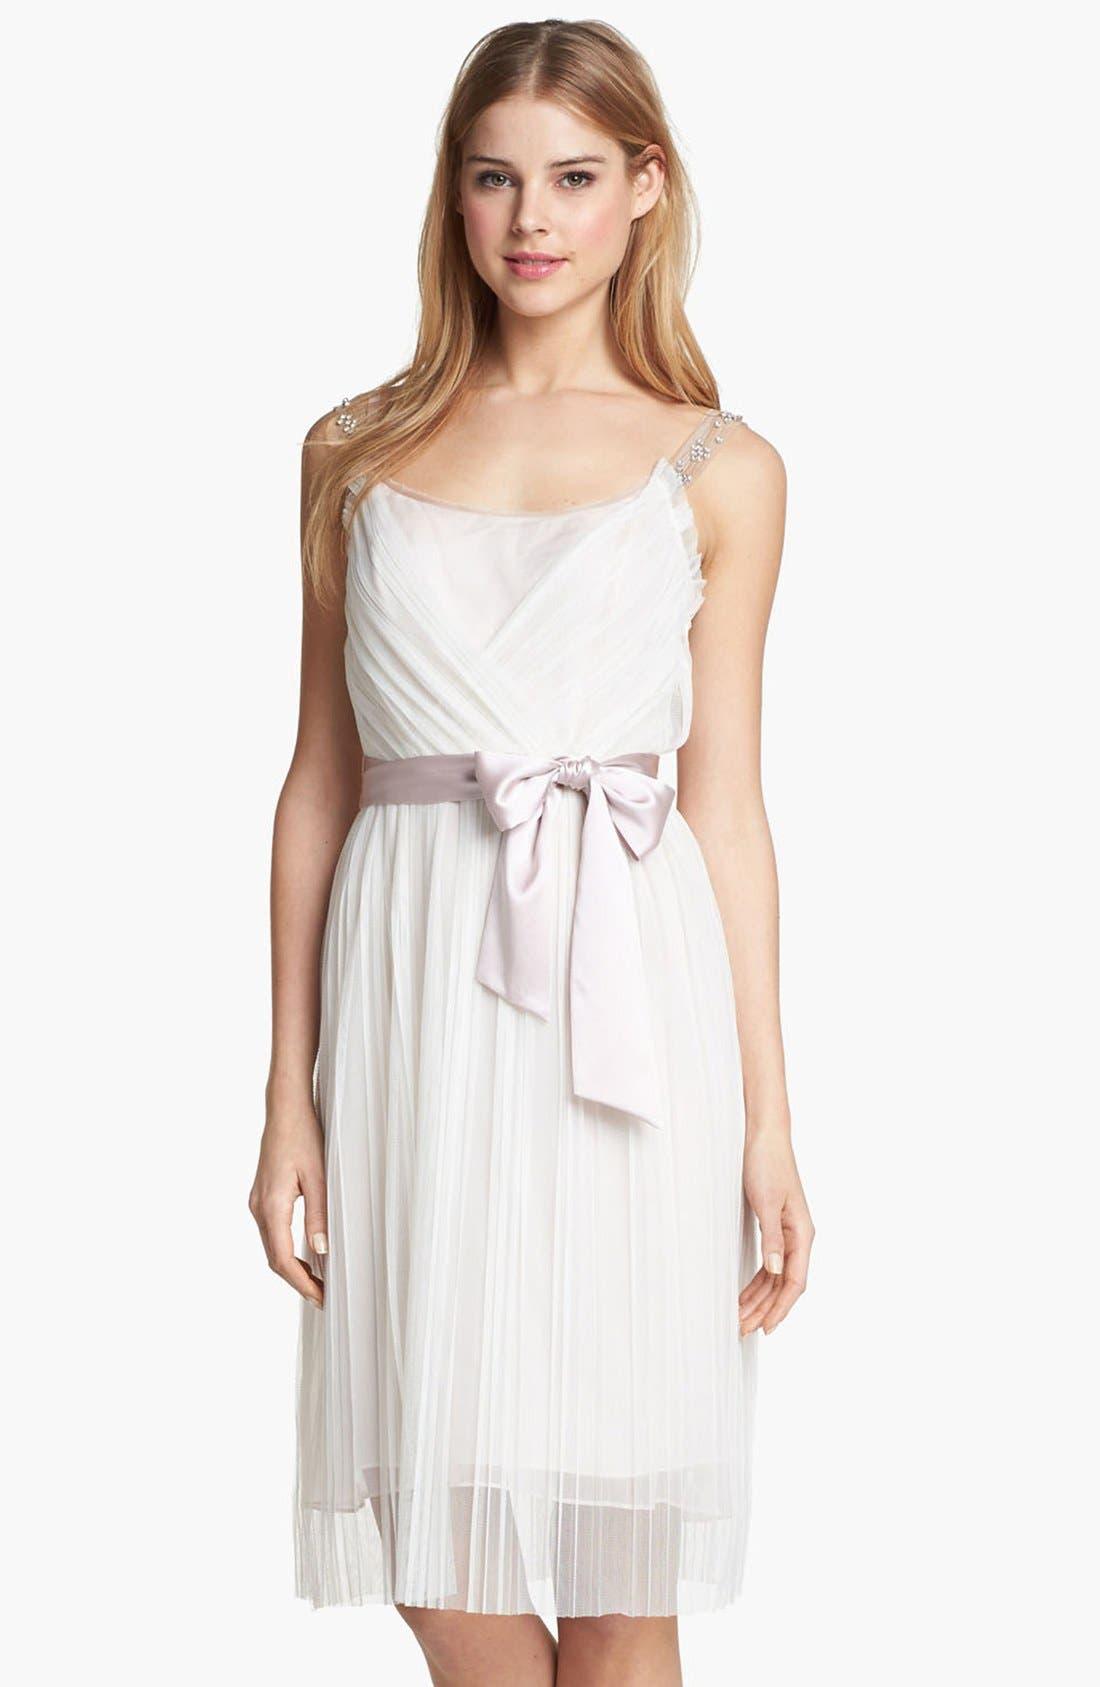 Main Image - Ivy & Blu Embellished Pleat Chiffon Dress (Online Only)